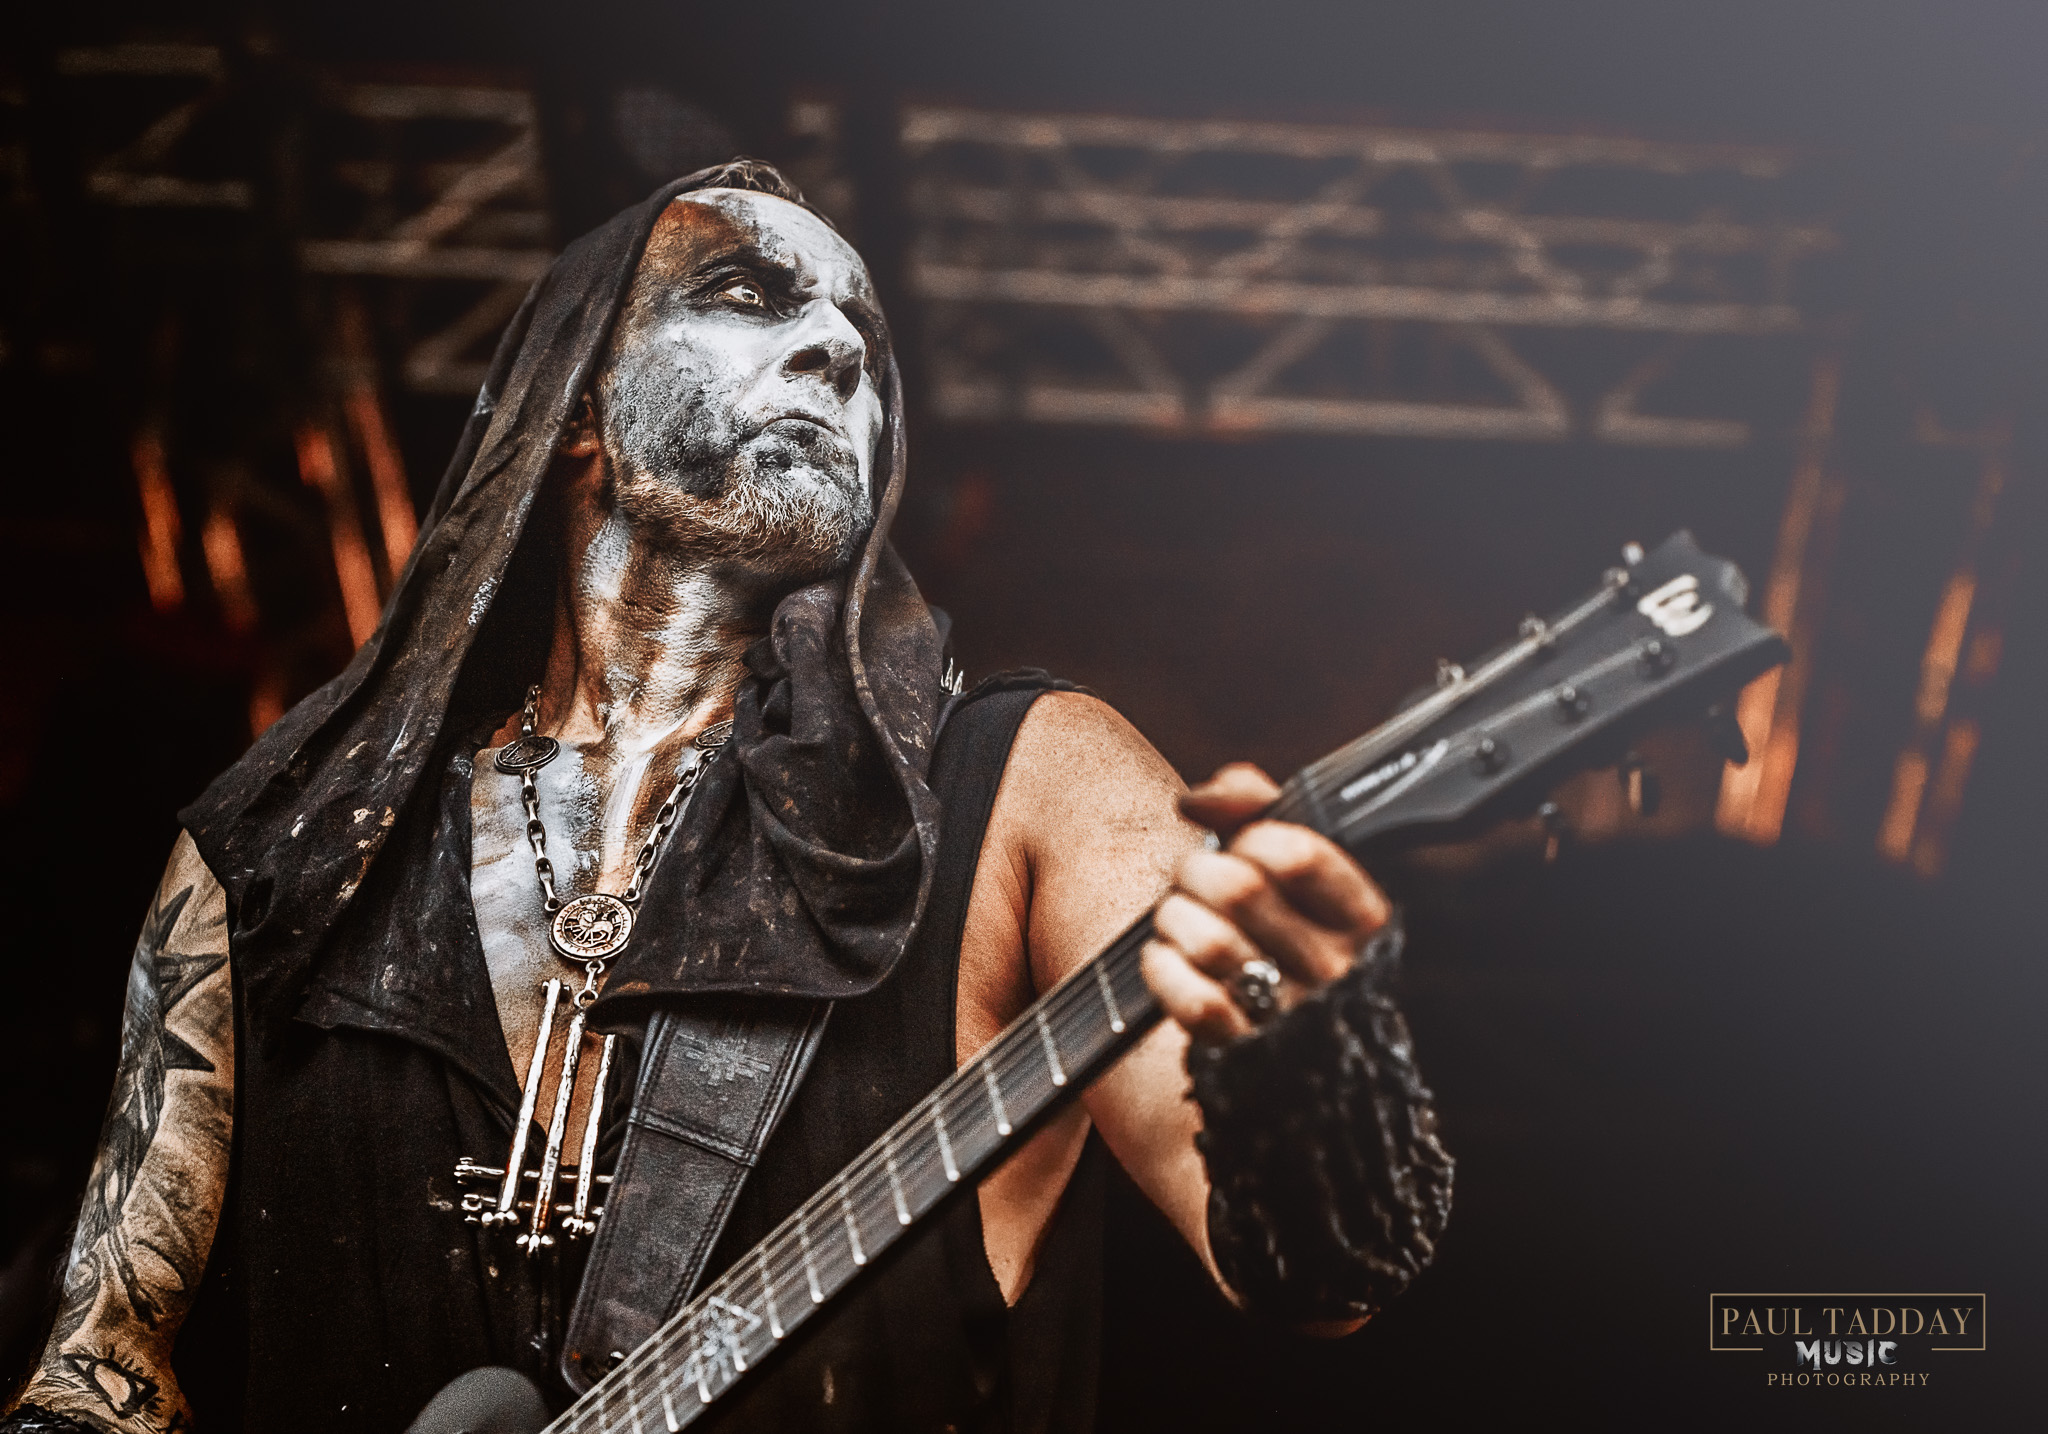 behemoth - brisbane - march 7 2019 - web - paul tadday photography - 2.jpg